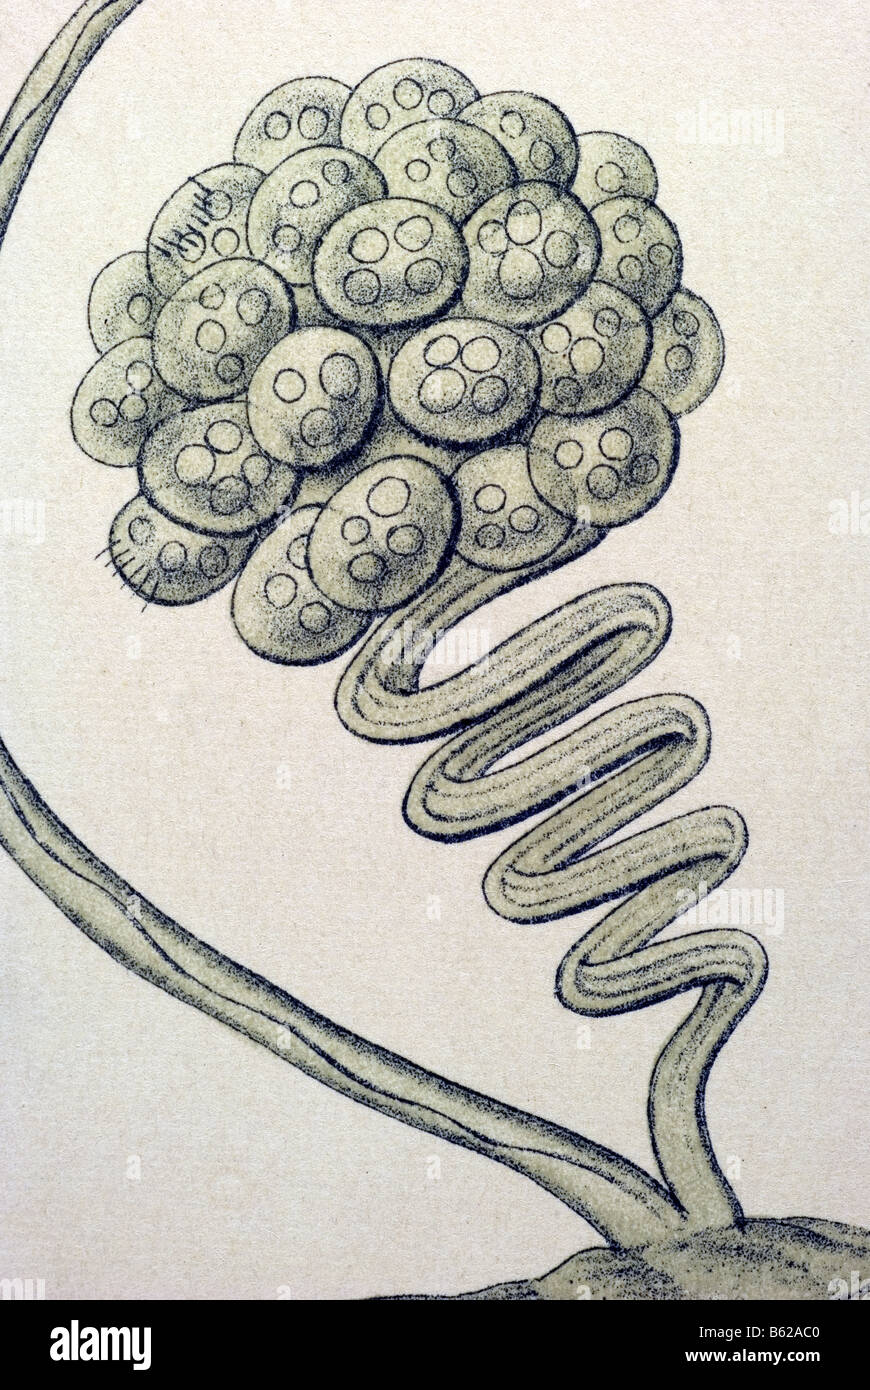 Ciliata / Wimperlinge, nome Stentor, Haeckel, Kunstformen der Natur, art nouveau, xx secolo, in Europa Immagini Stock